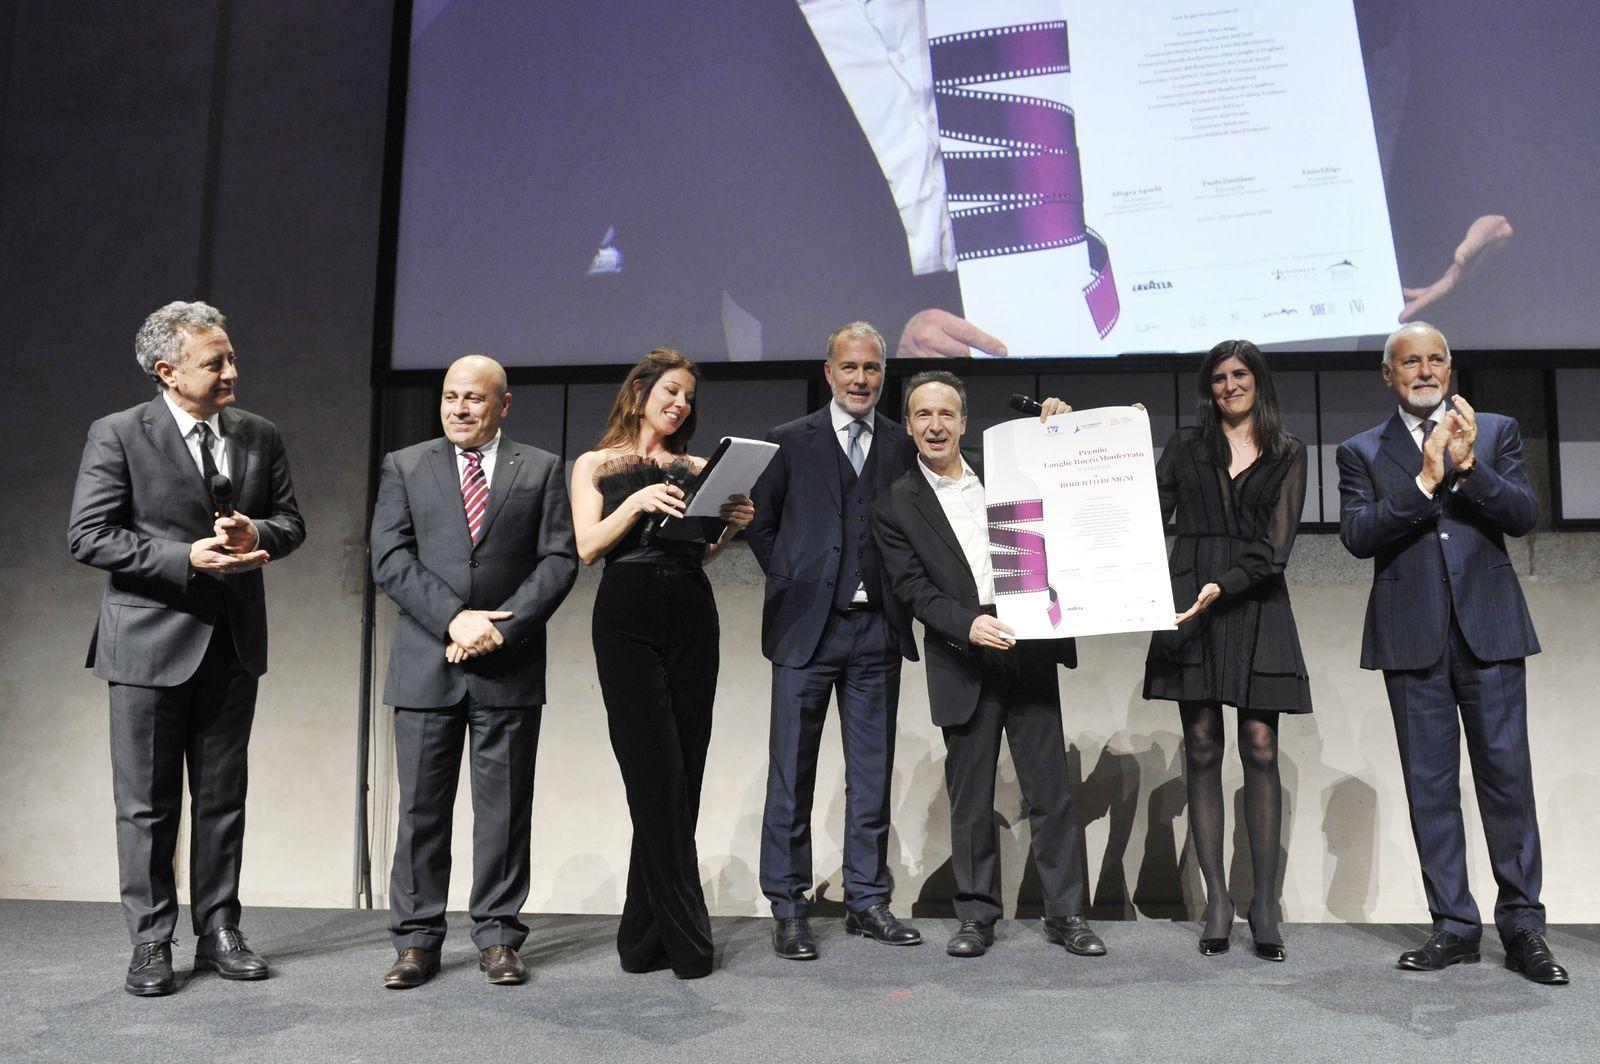 premio-langhe-roero-monferrato-2019-07